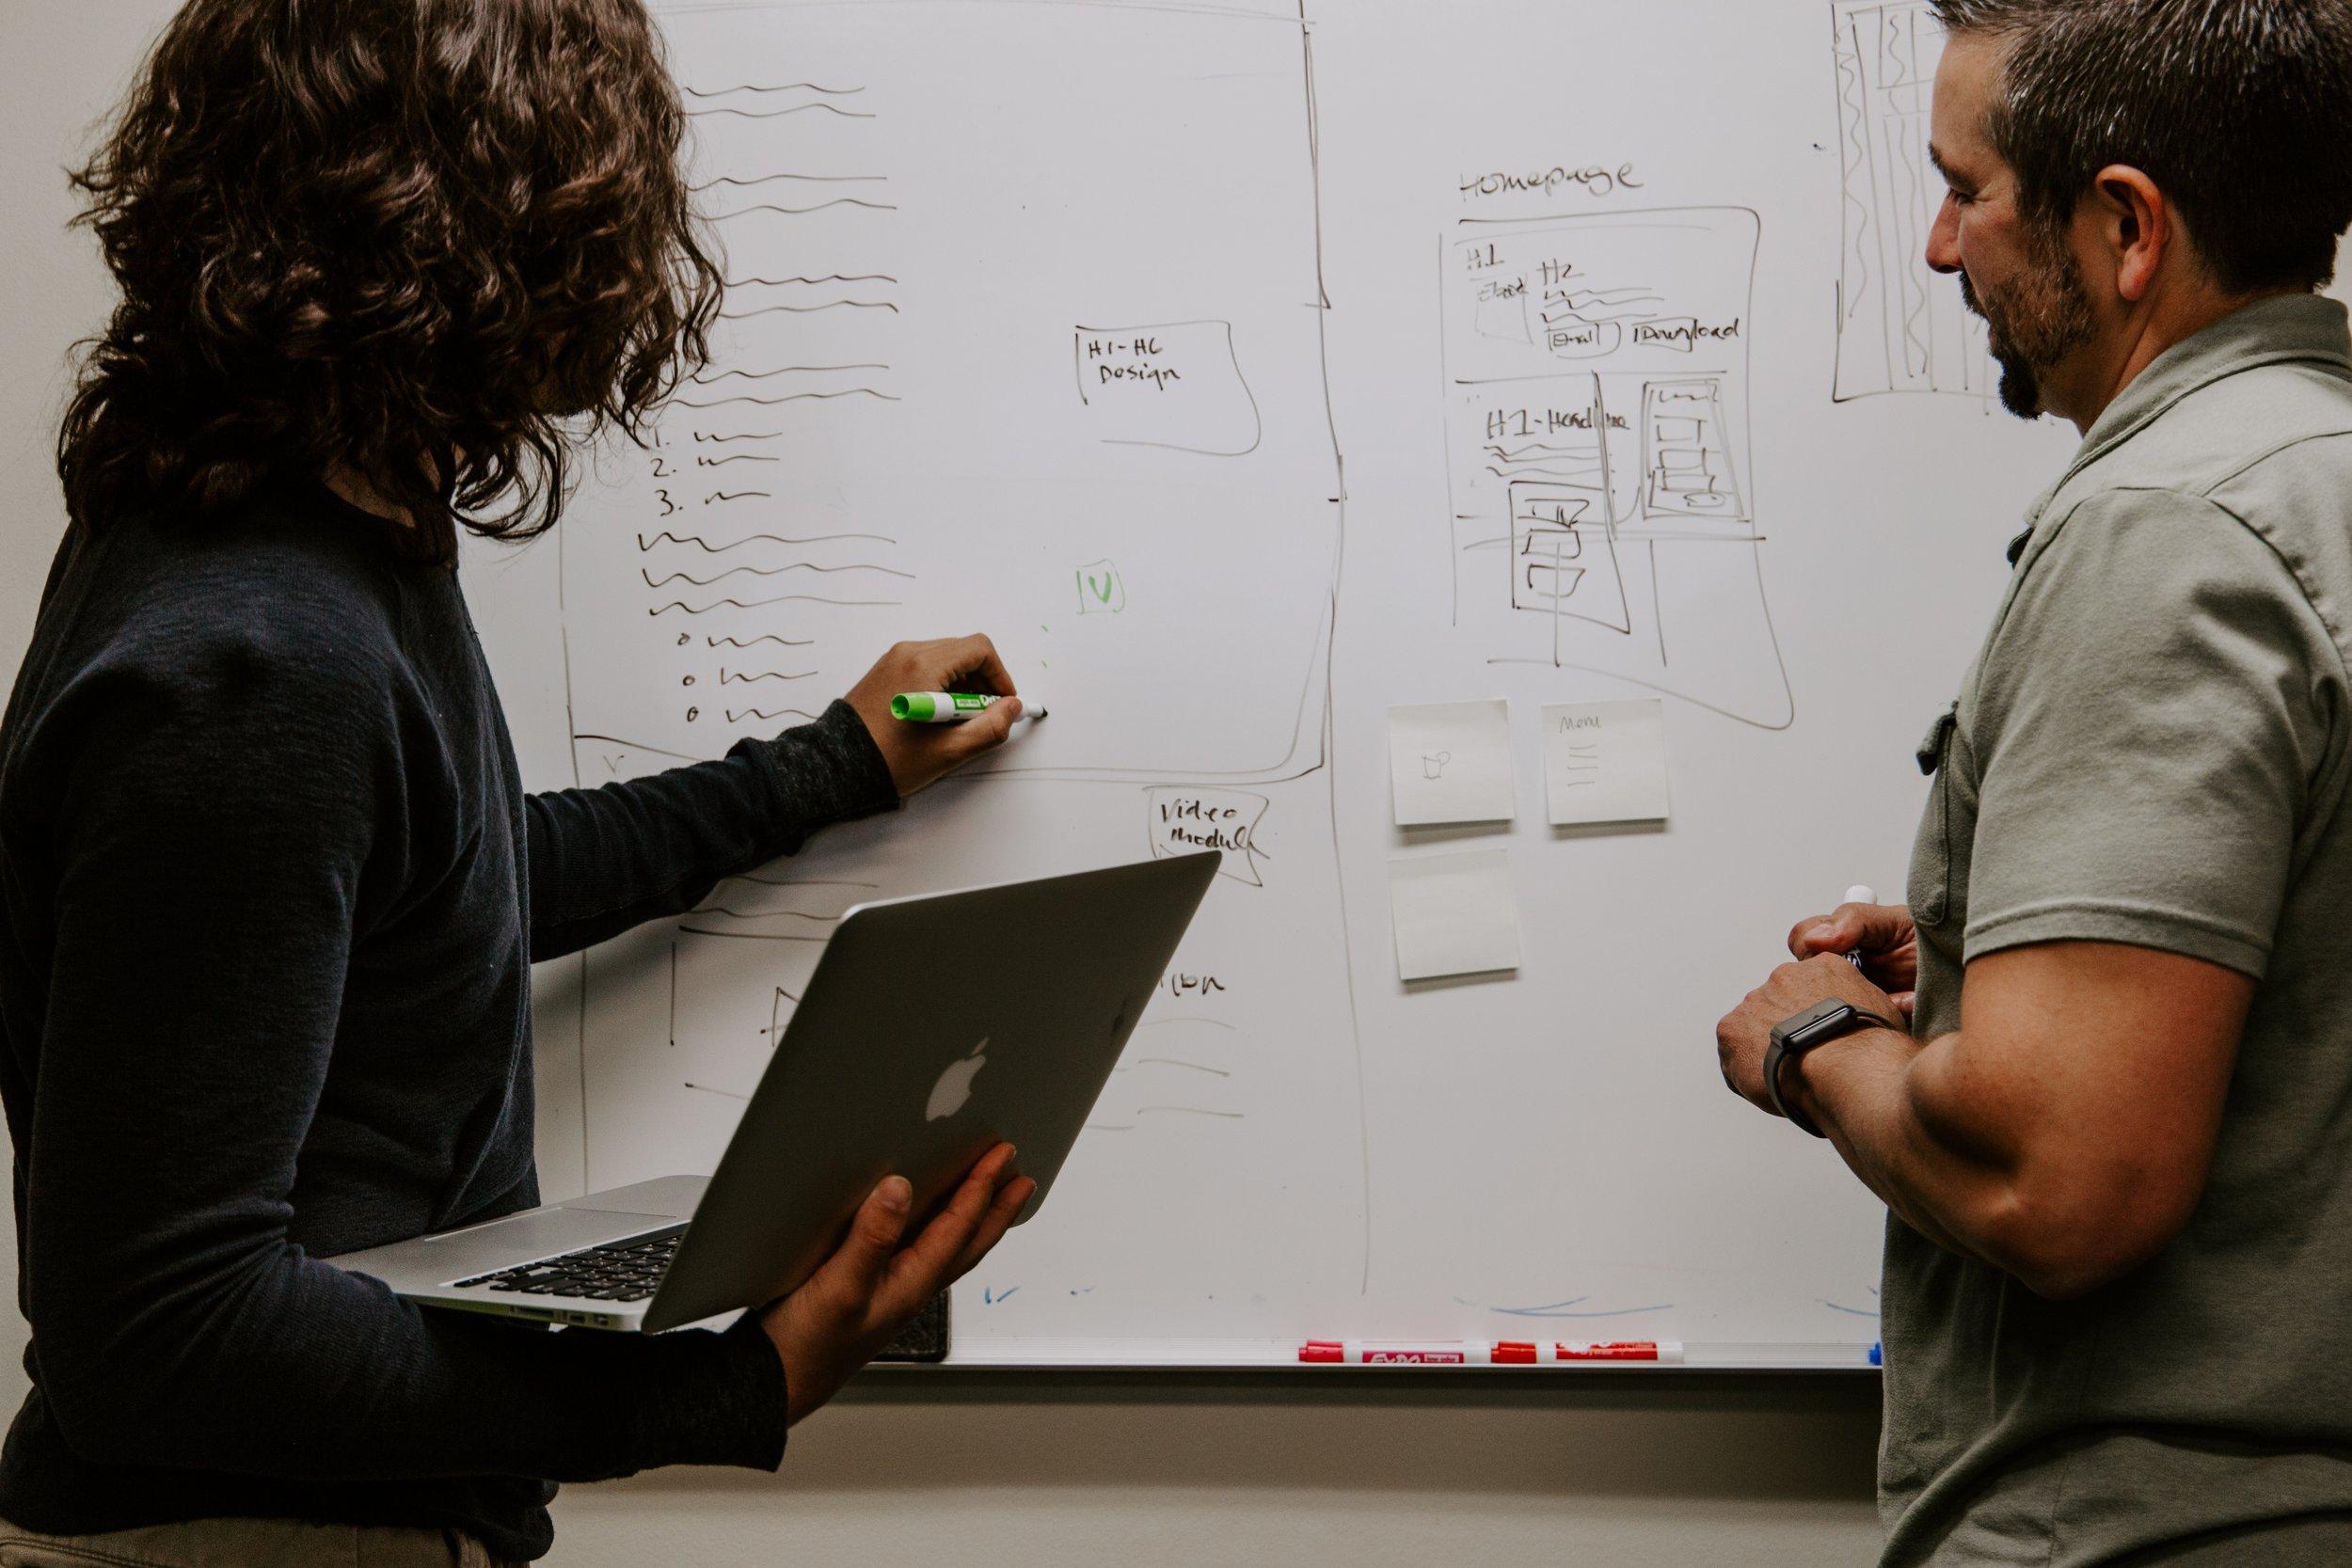 communicate-law-of-the-edge-training-Minneapolis-training.jpg